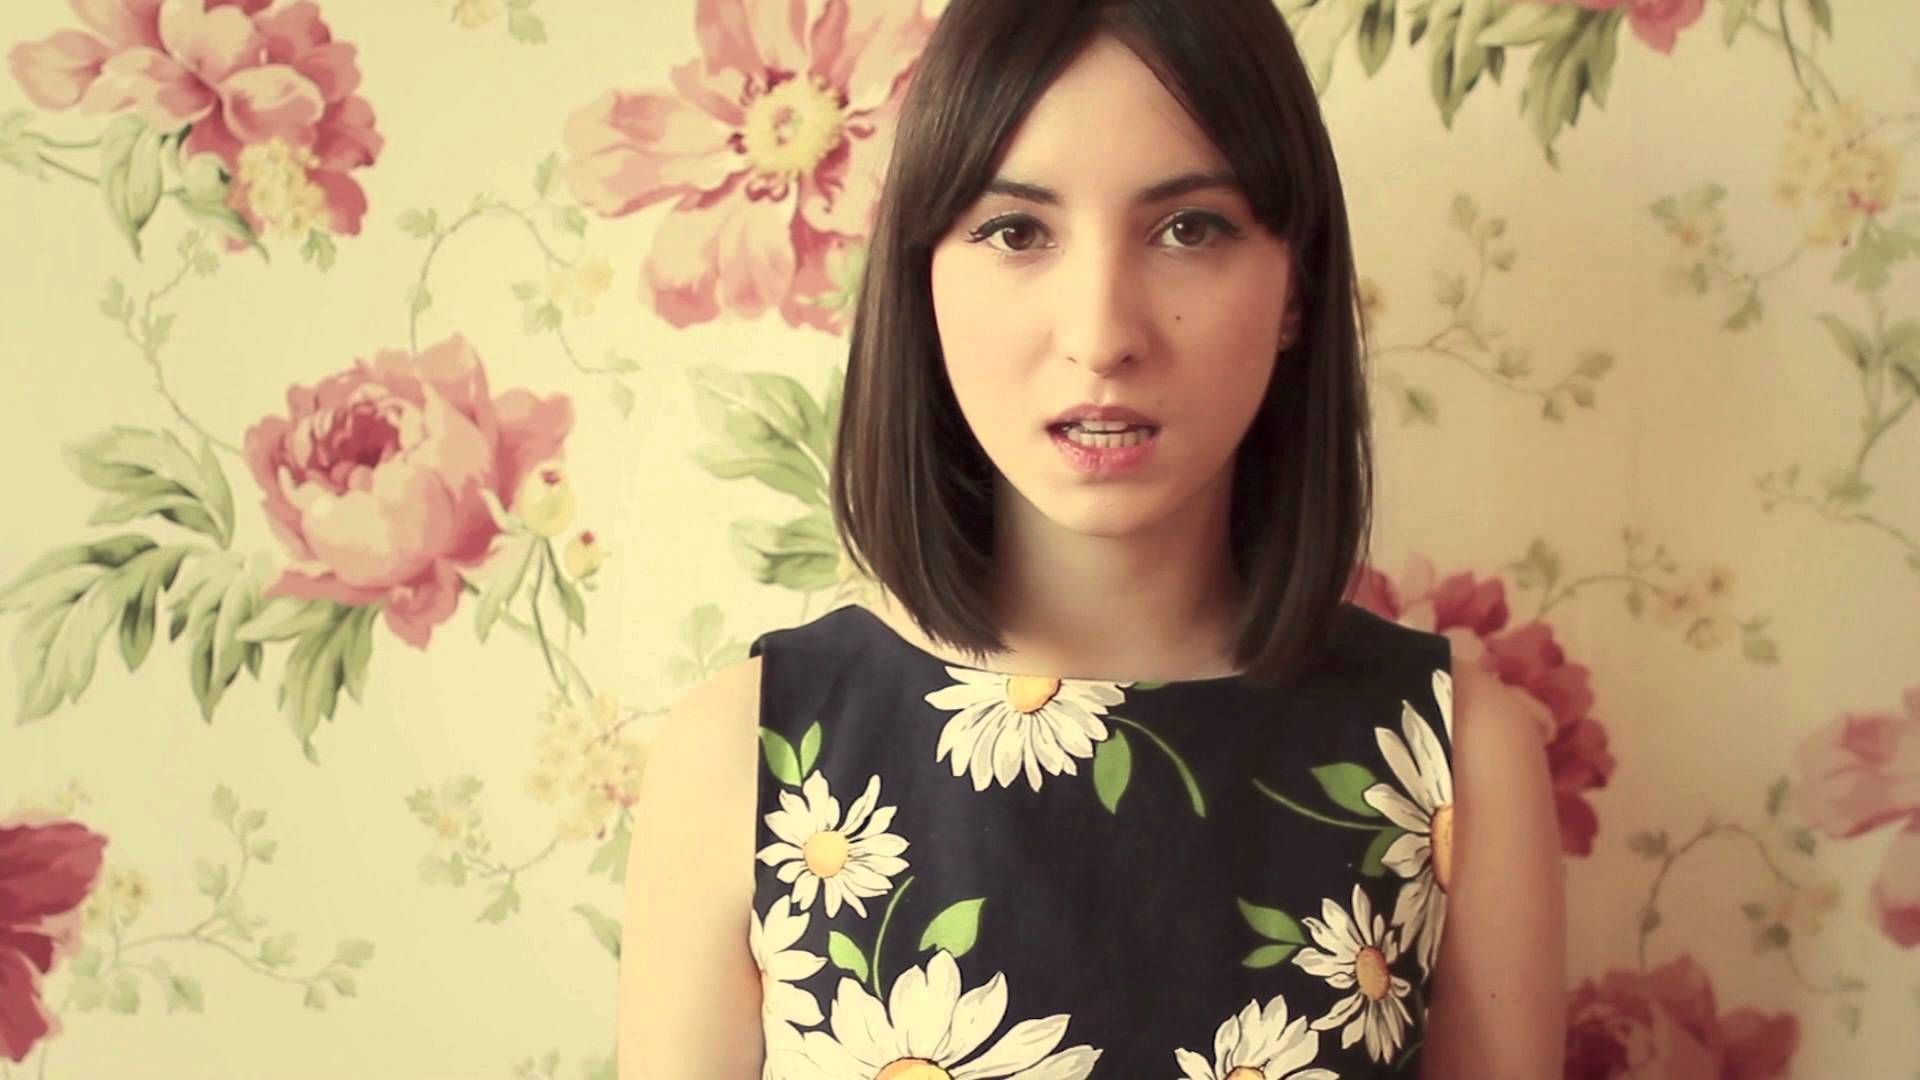 克莉絲汀娜 / 我已無法繼續 Cristina Quesada / Ya No Puedo Más ( Music Video)